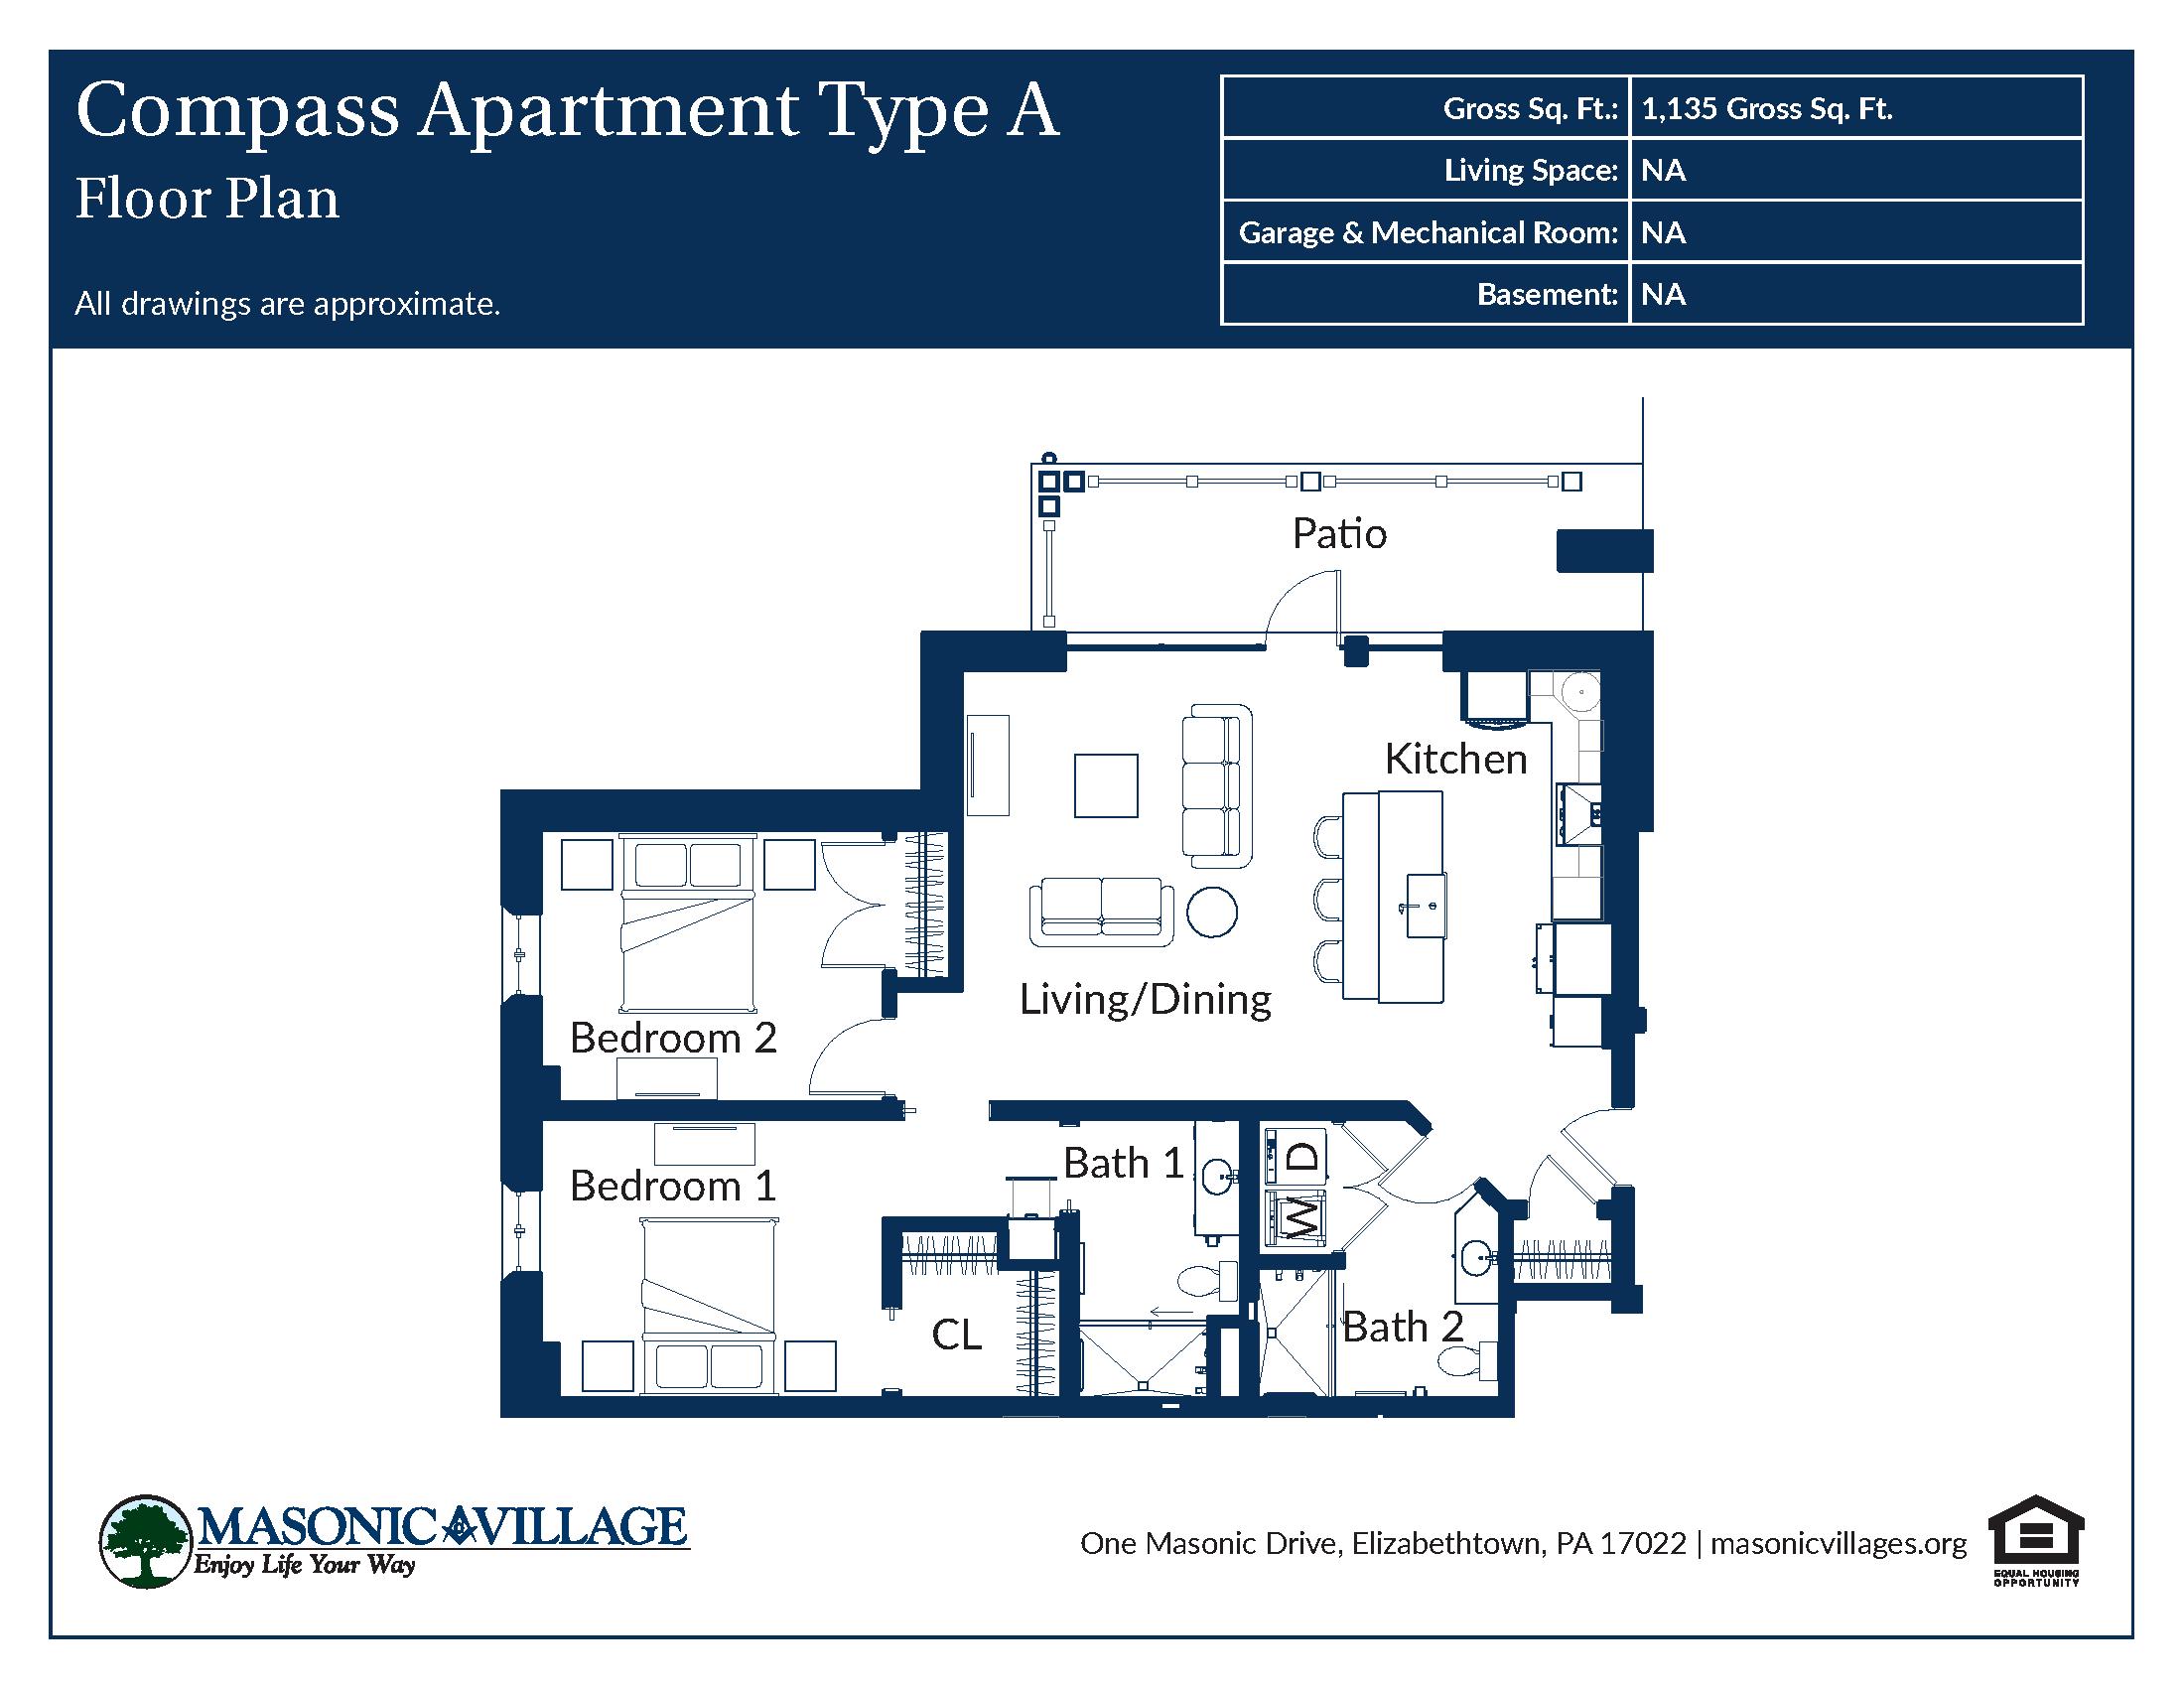 Masonic Village at Elizabethtown - Compass Apartment A Floor Plan